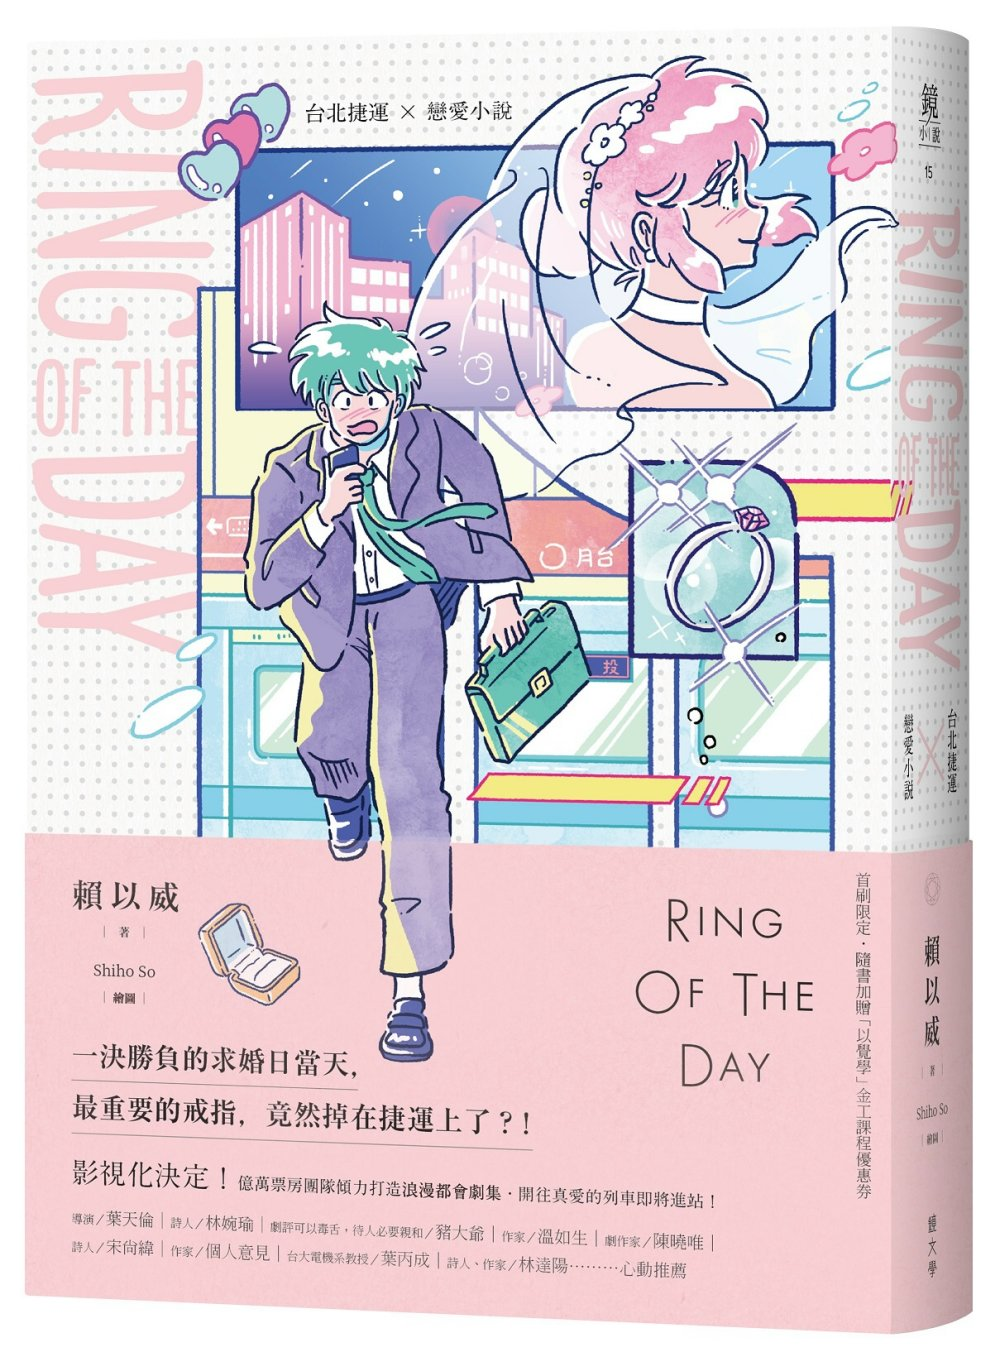 Ring of the Day:台北捷運 ╳ 戀愛小說【限量回饋版|賴以威親筆簽名+Shiho So插畫悠遊卡貼組】